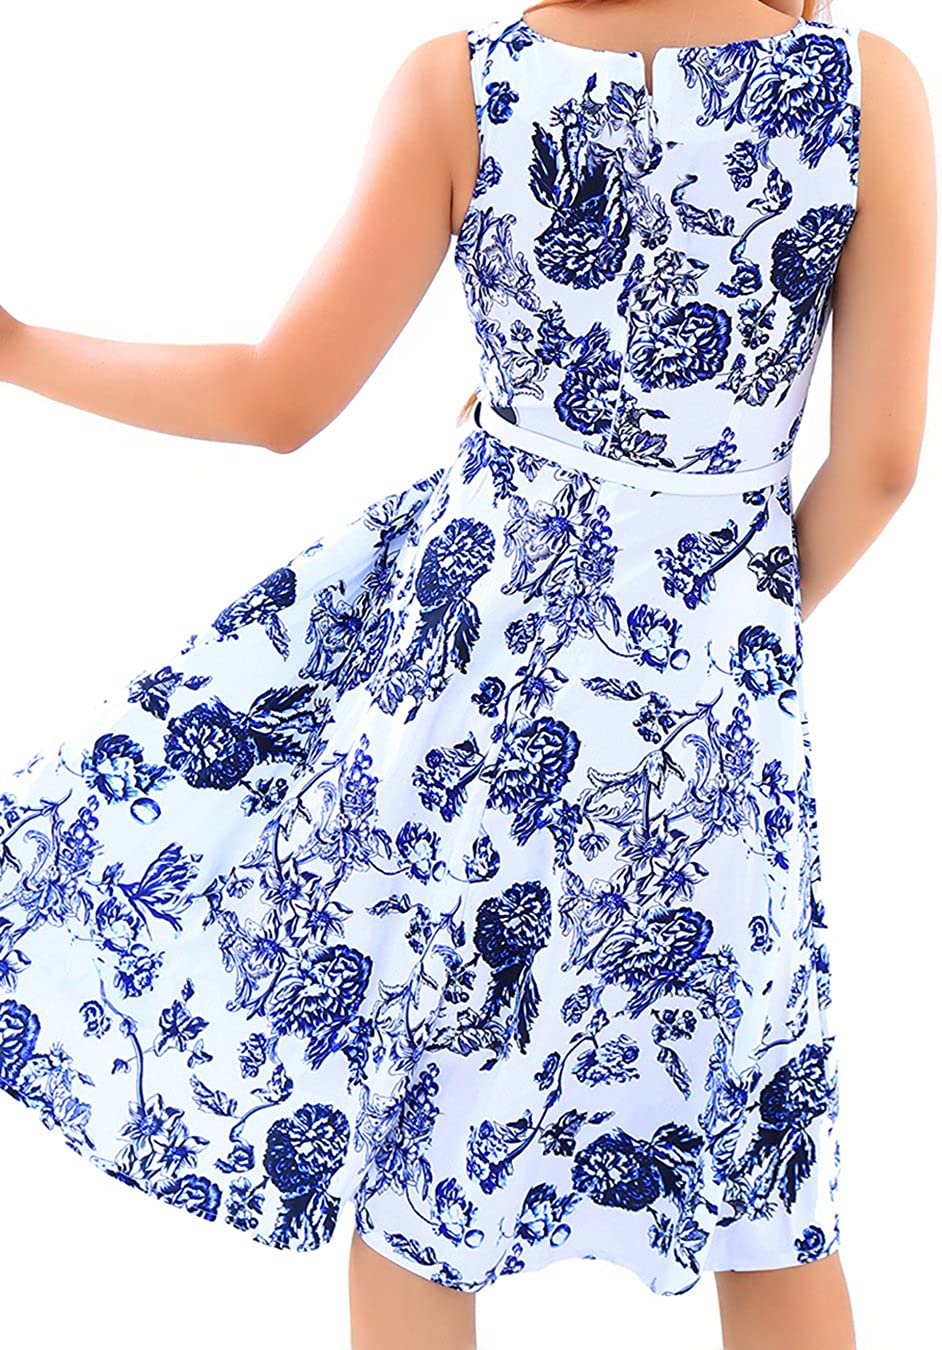 EFOFEI Womens Floral Printed Sleeveless Vintage Swing Summer Midi Party Retro Dress